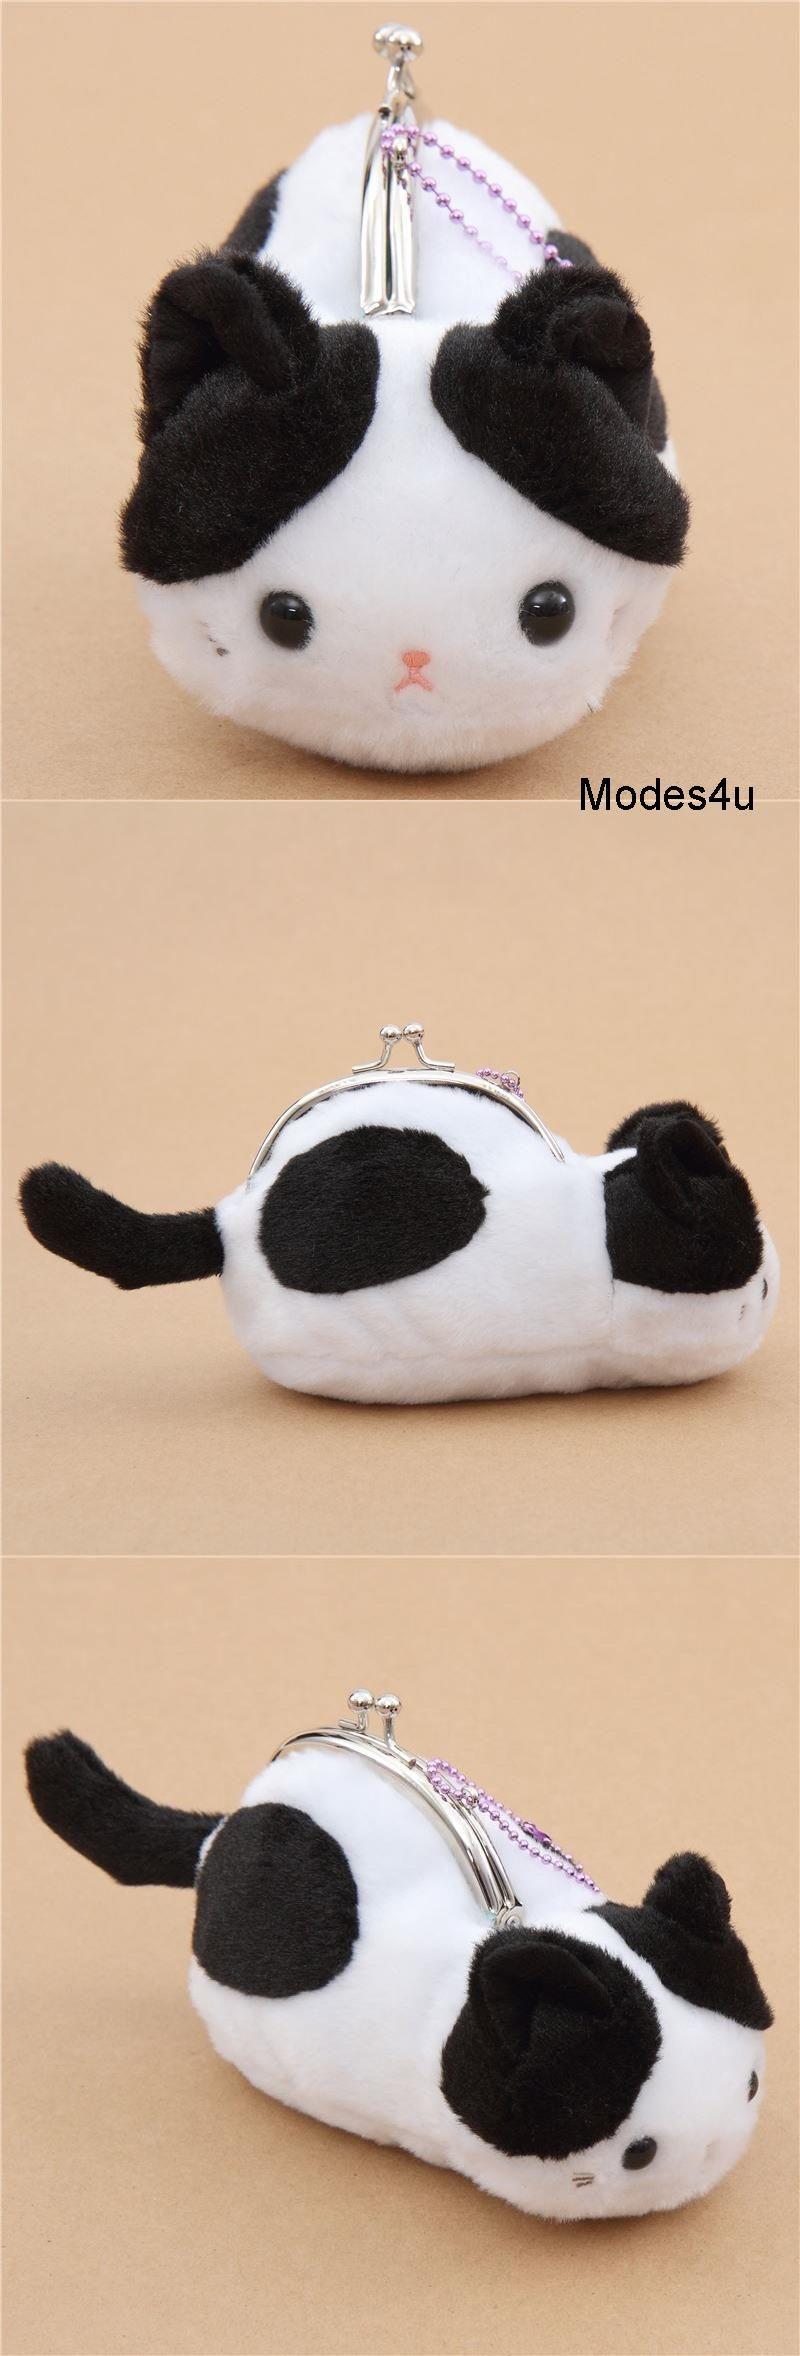 Pin by Modes4u on Kawaii Plush Toys Black cat plush, Cat